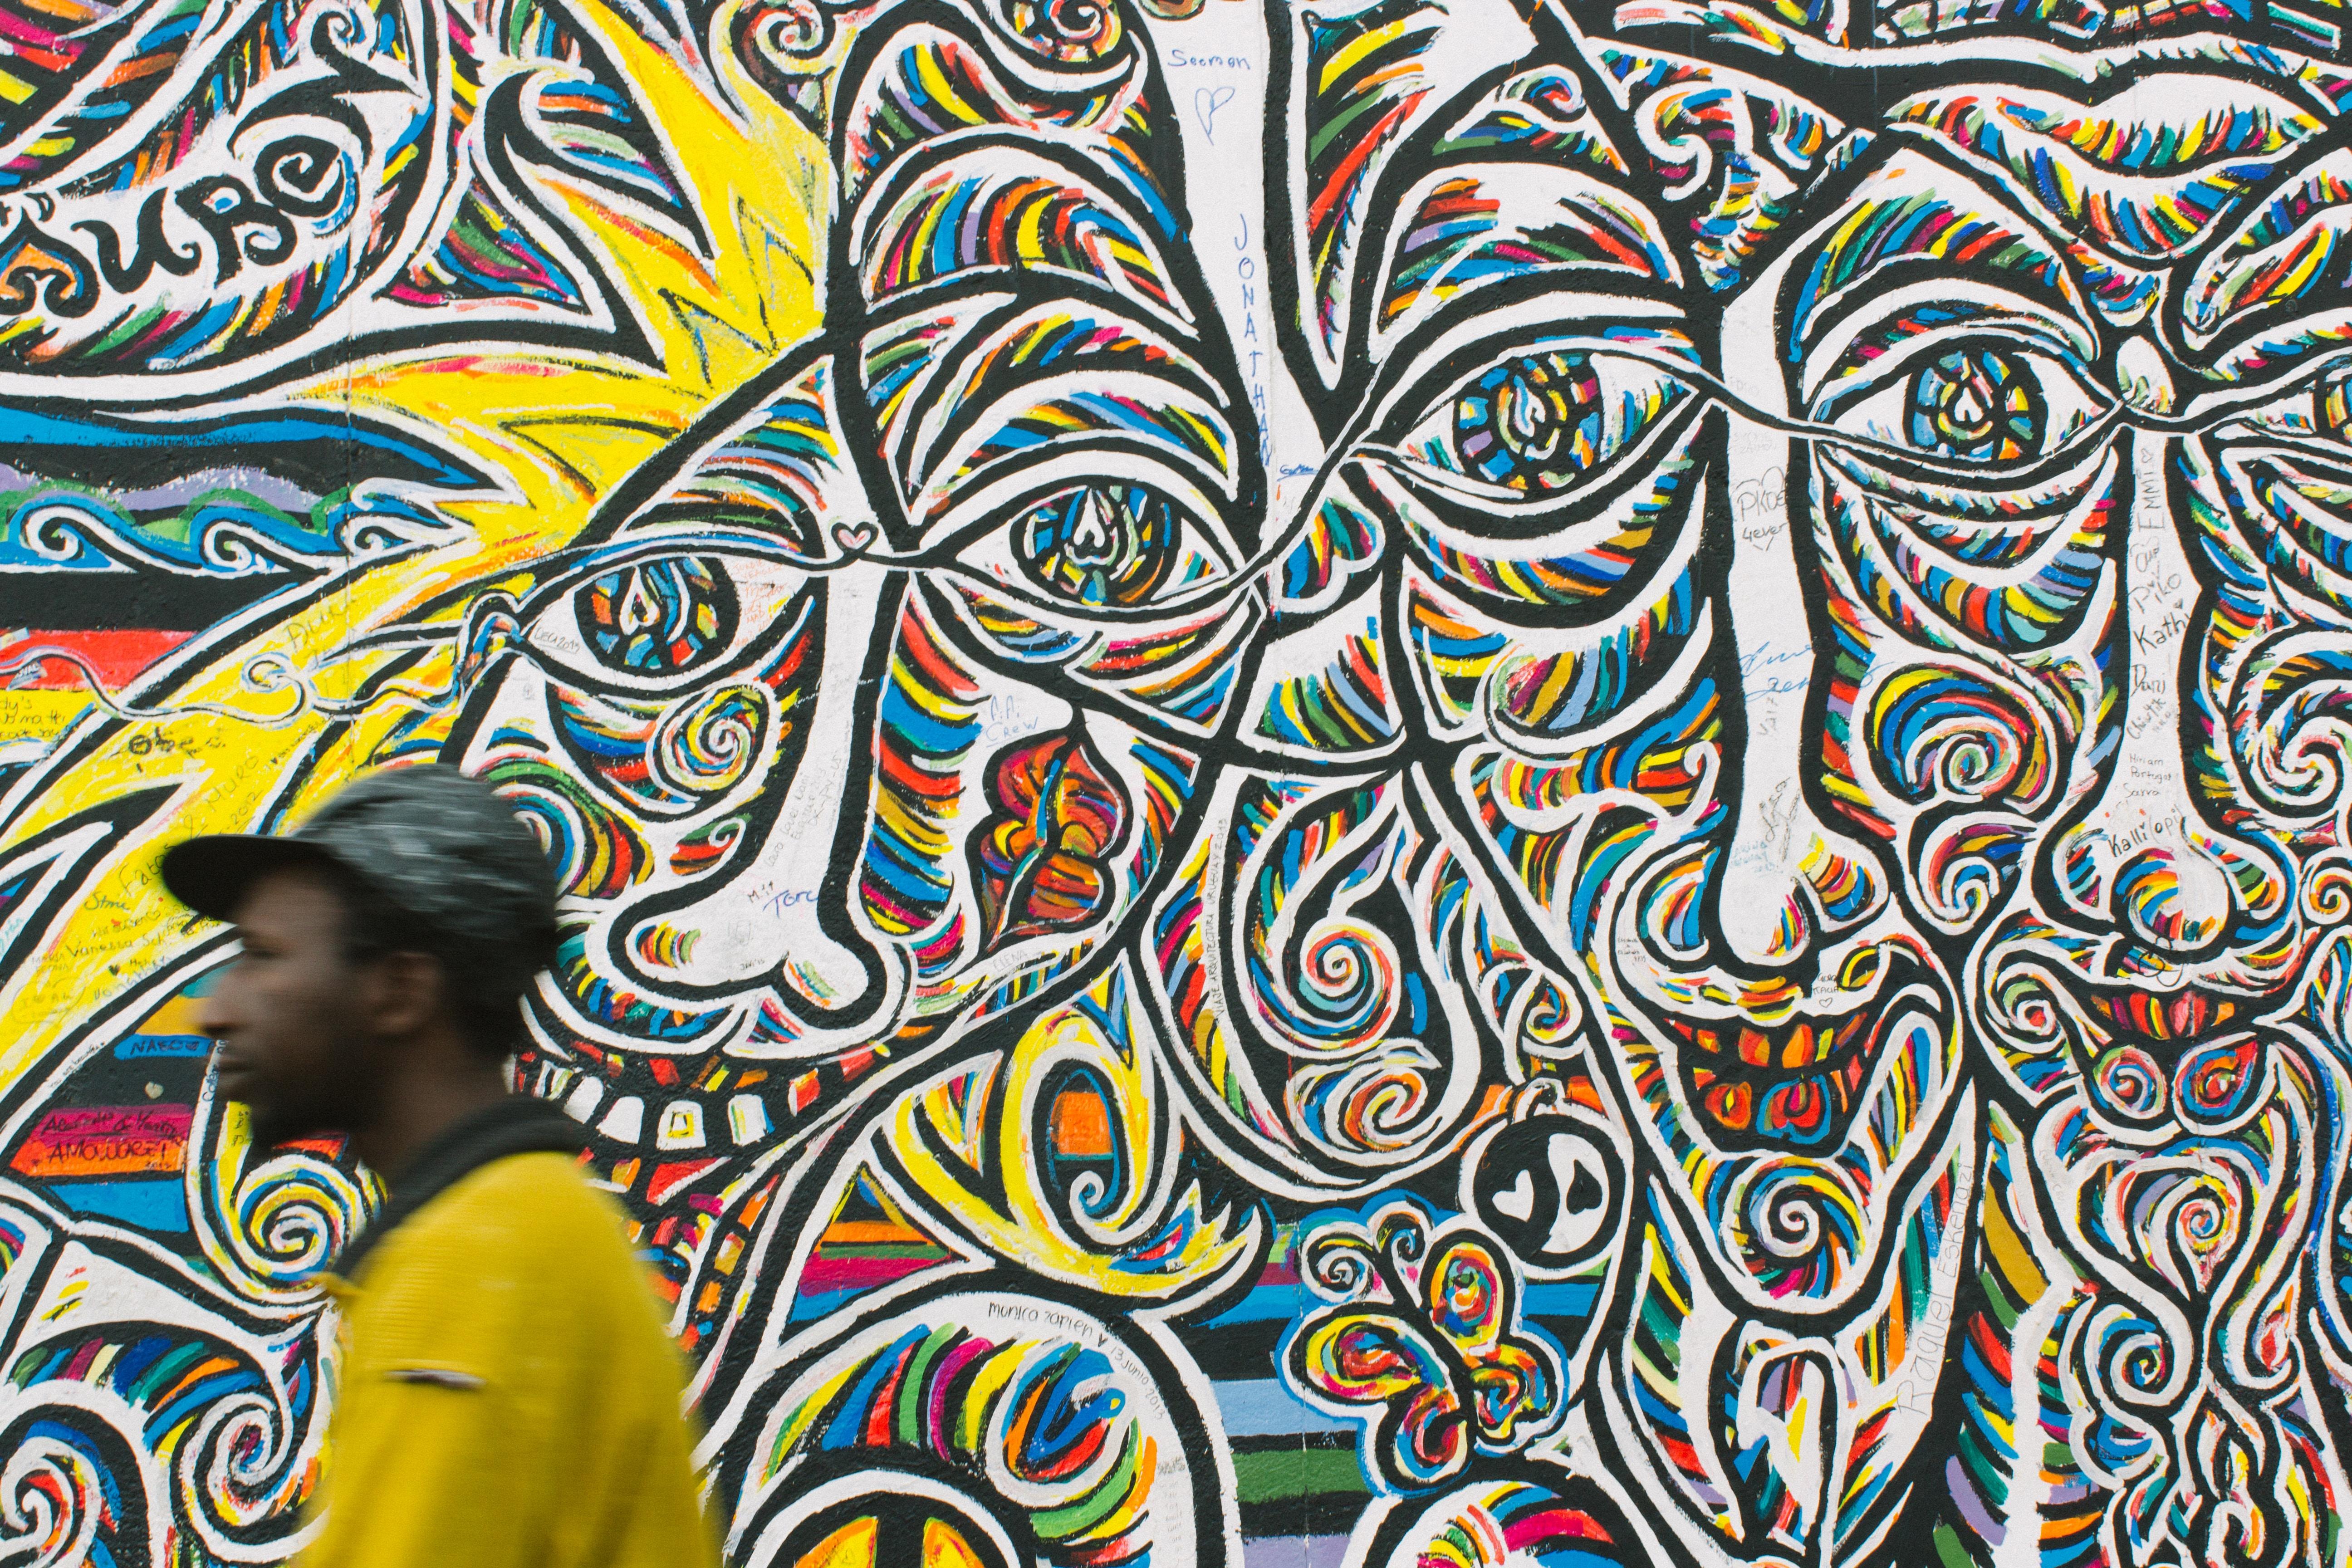 man standing near graffiti art